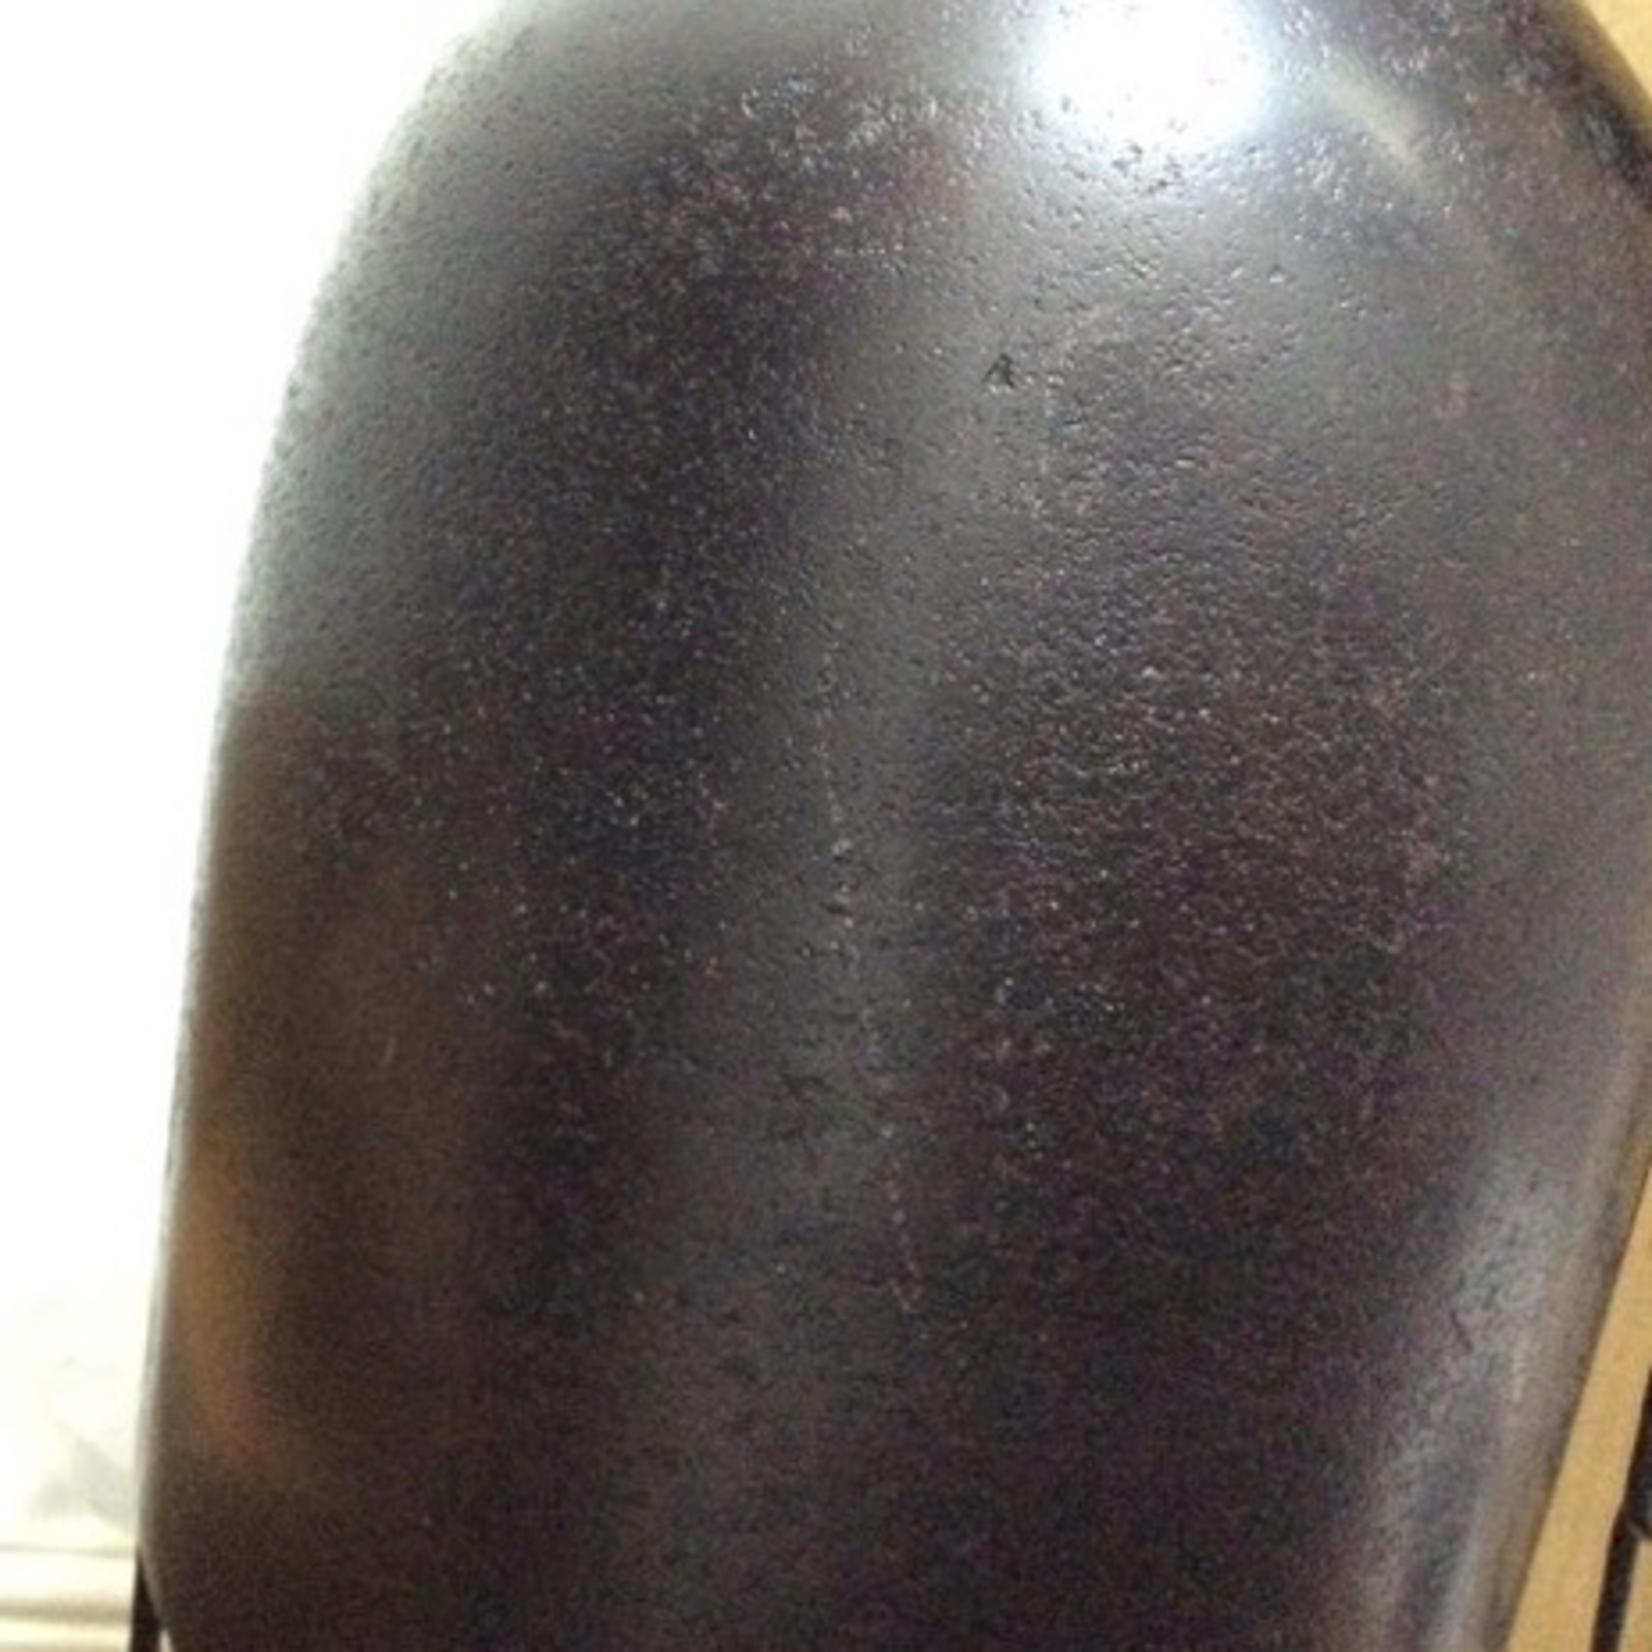 Light & Living DISCOUNTED Undine antique bronze & black hanging lamp 16x50cm - scratched